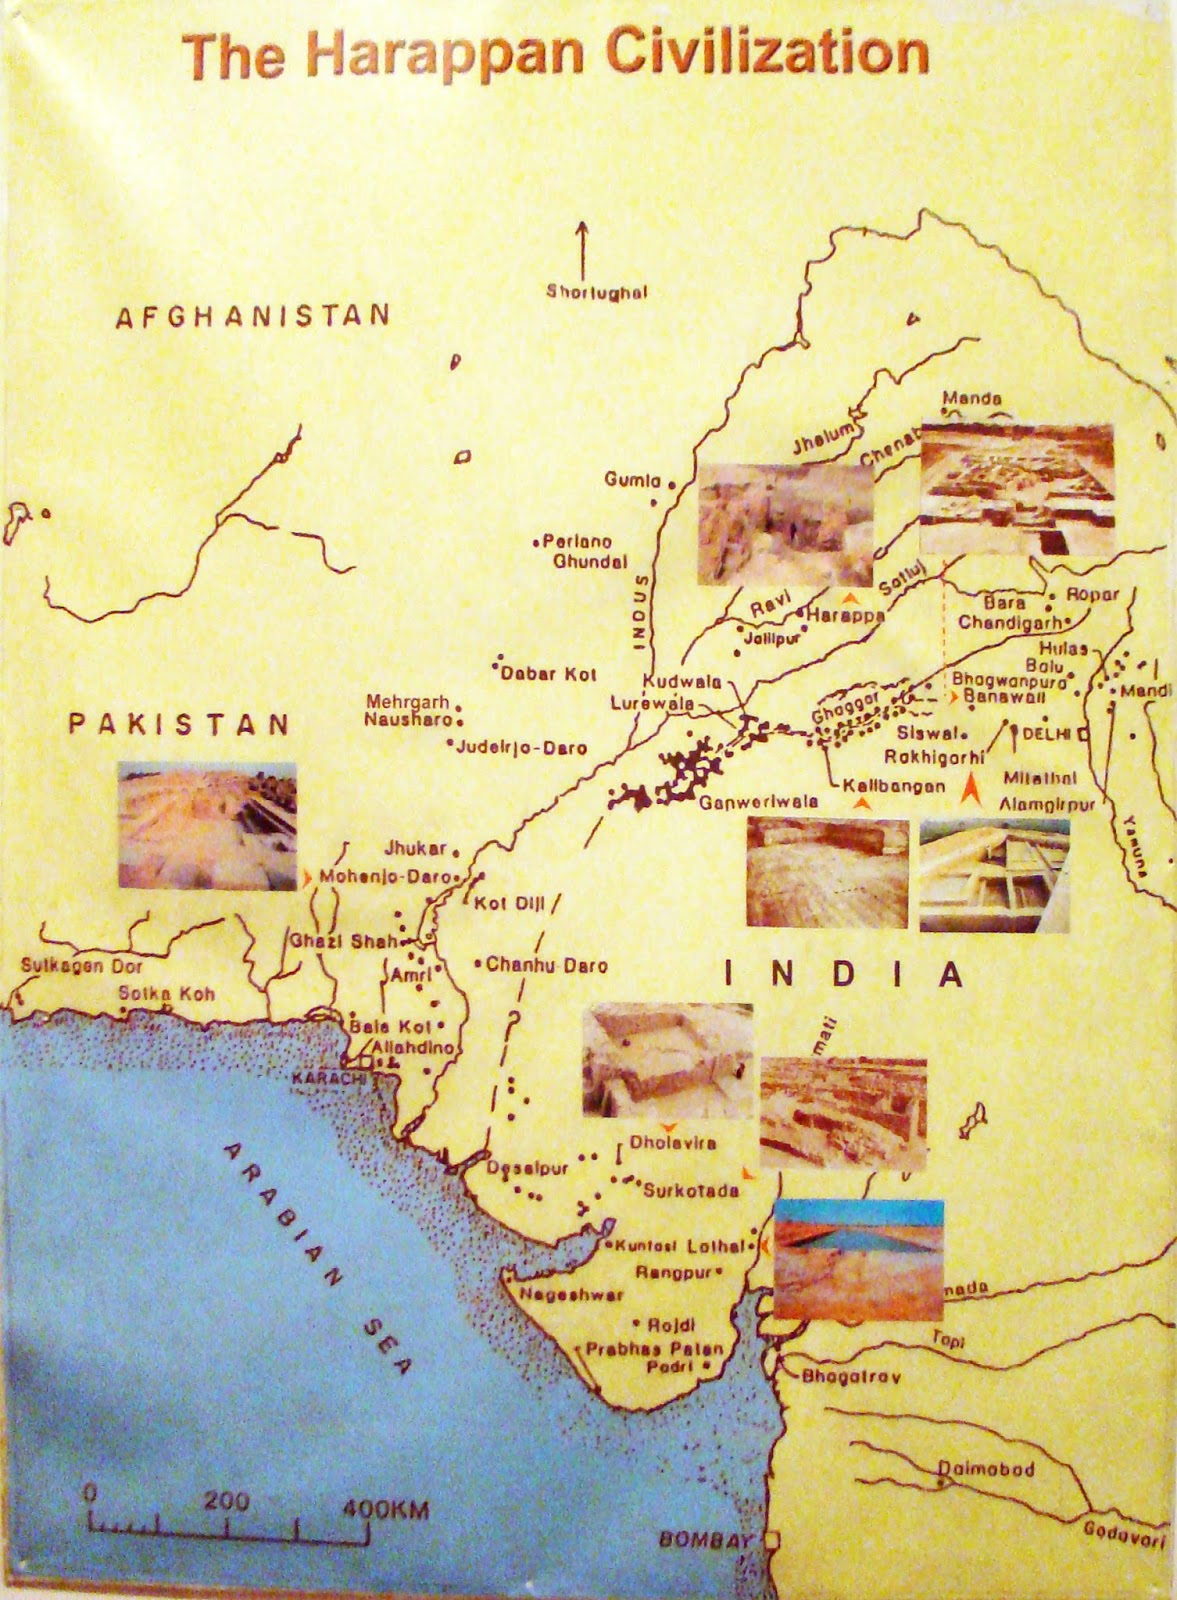 Civilservicearticle Indus Valley Cvilisation